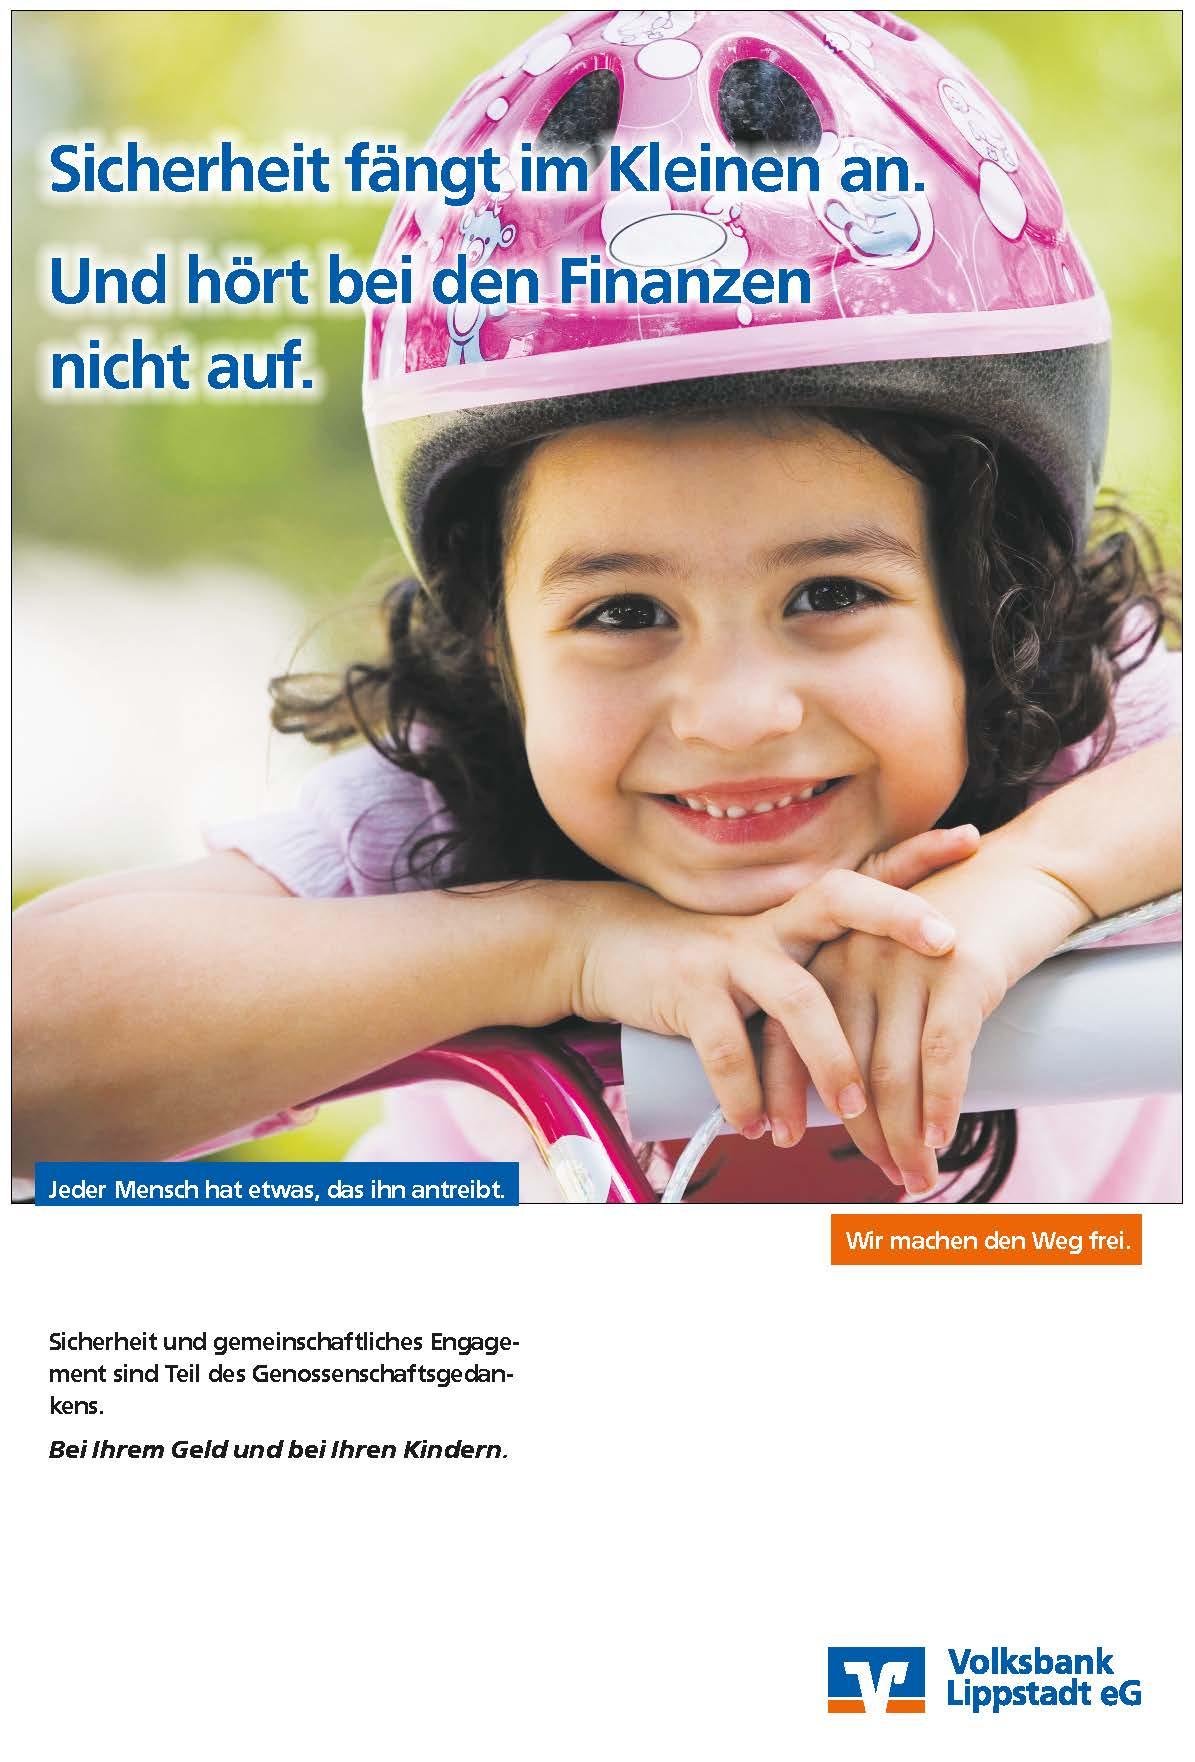 Volksbank Image